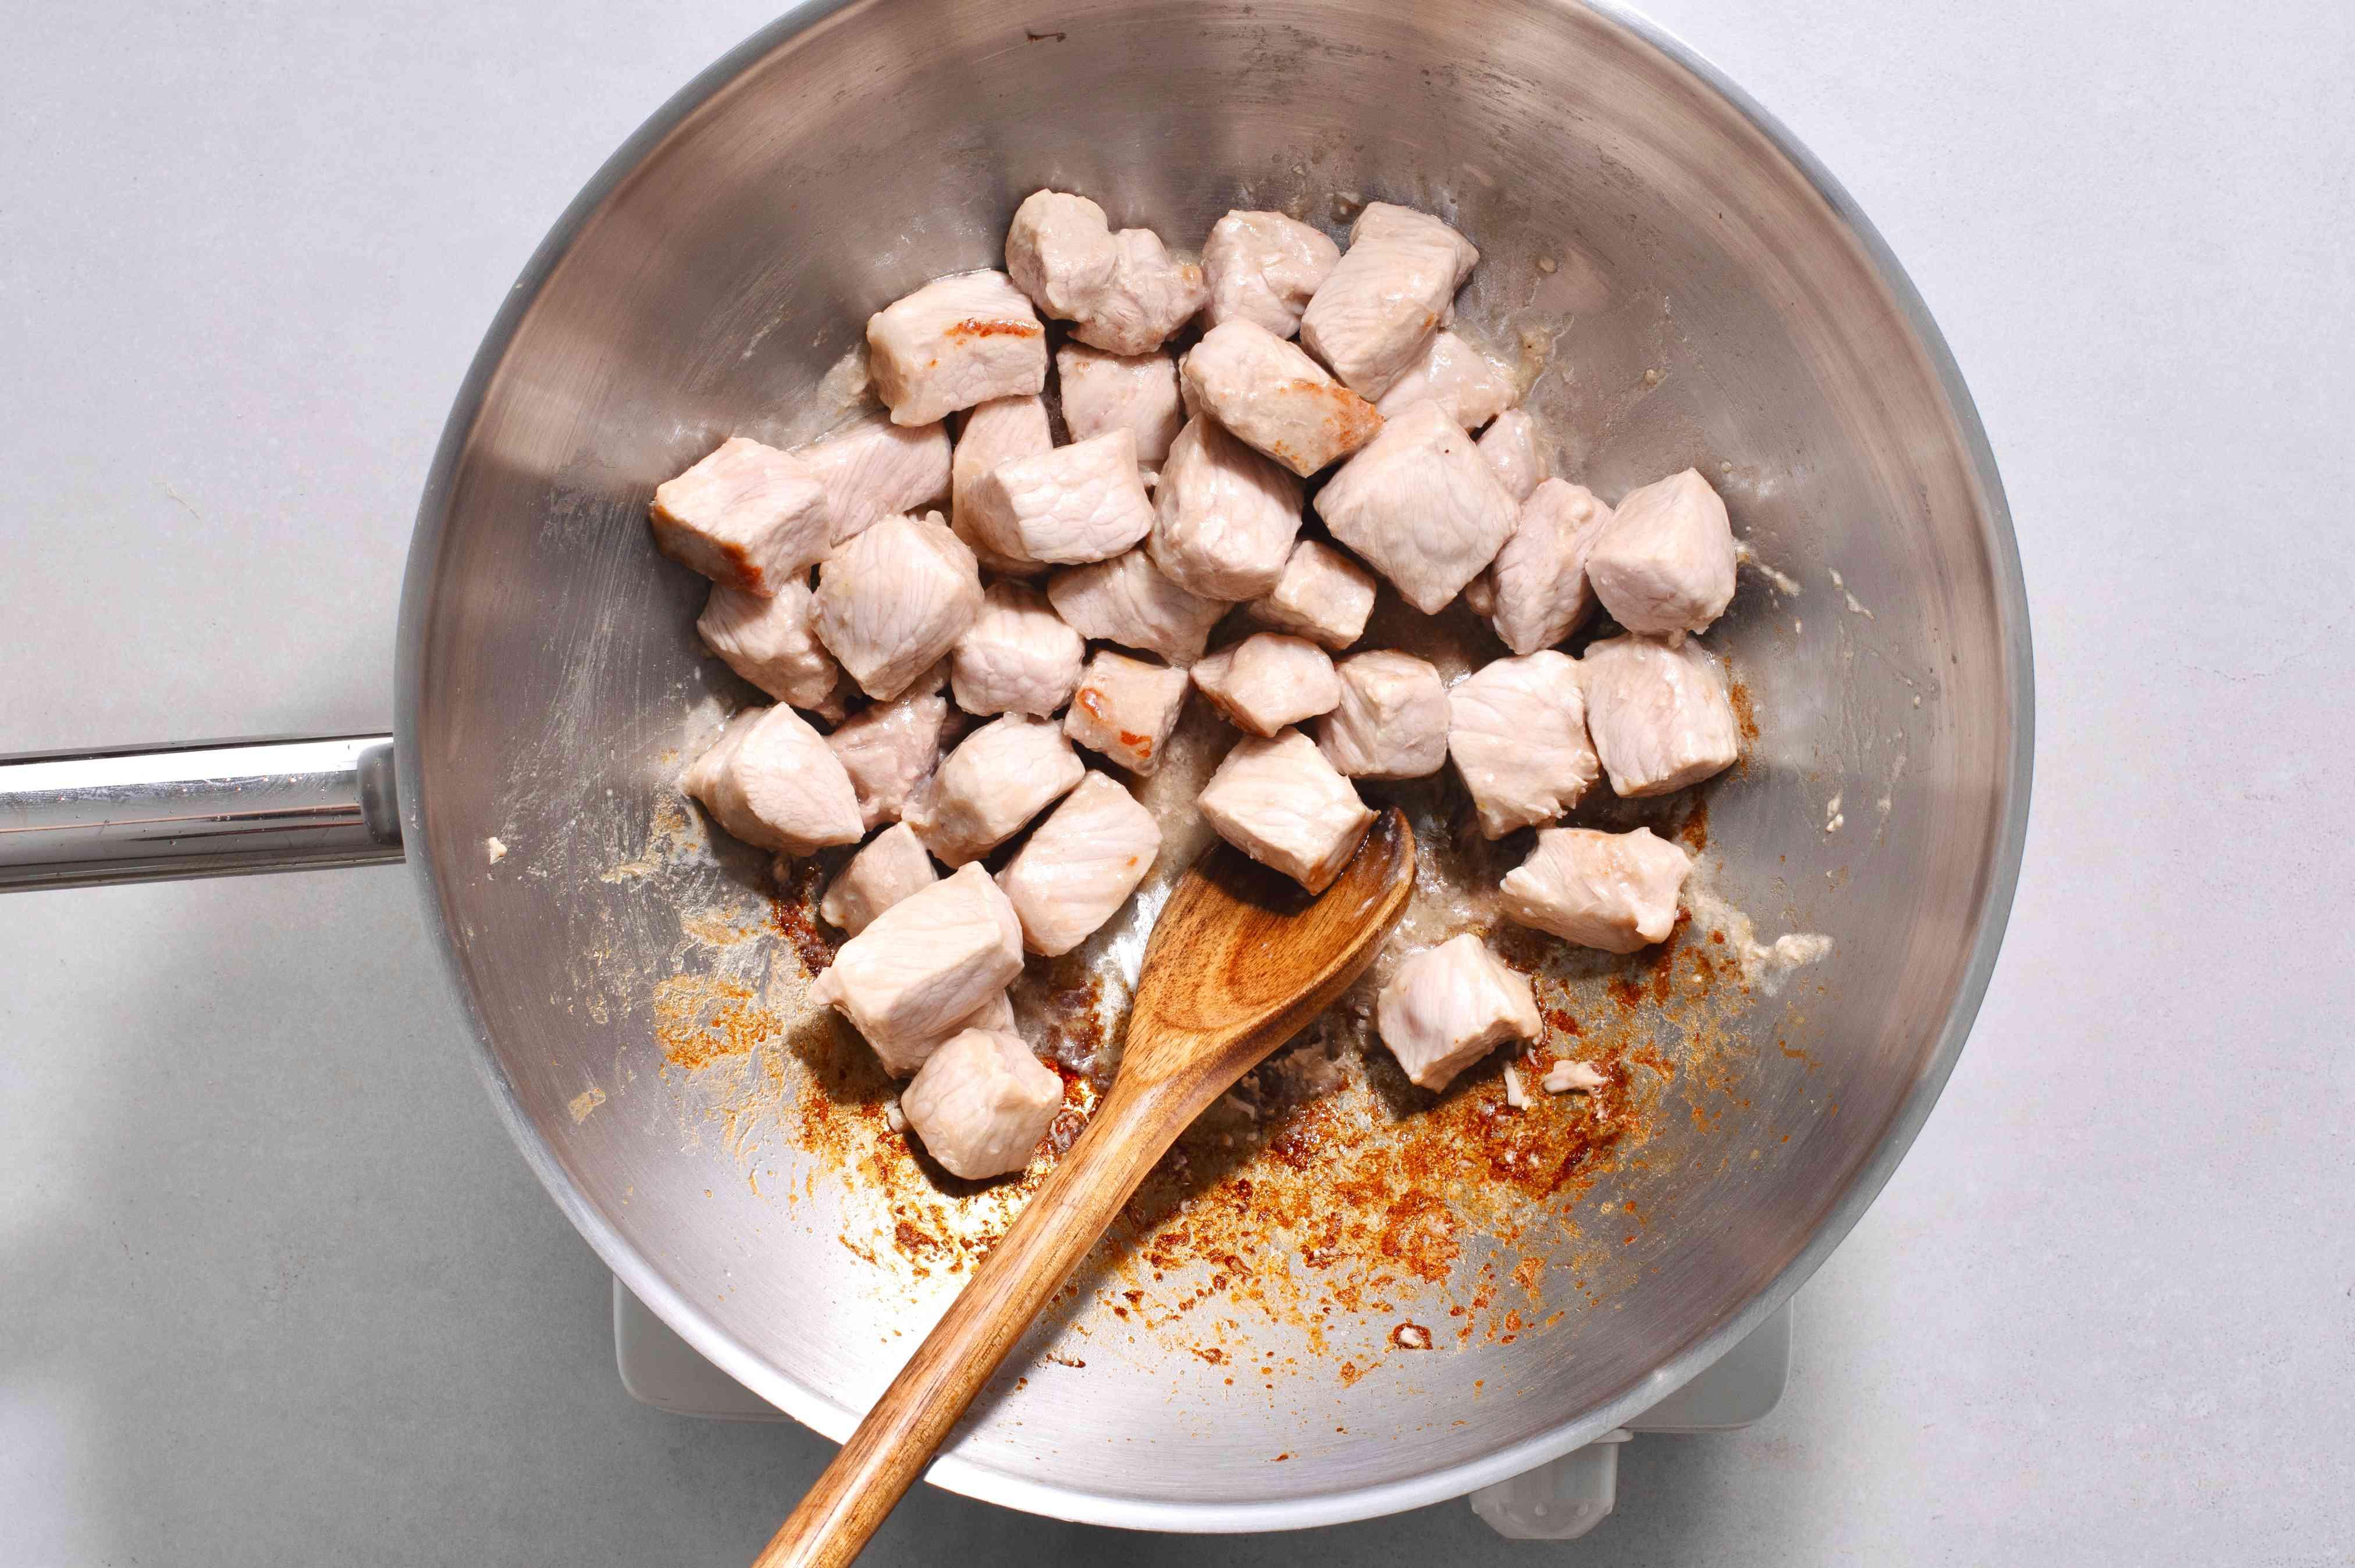 pork cooking in a wok